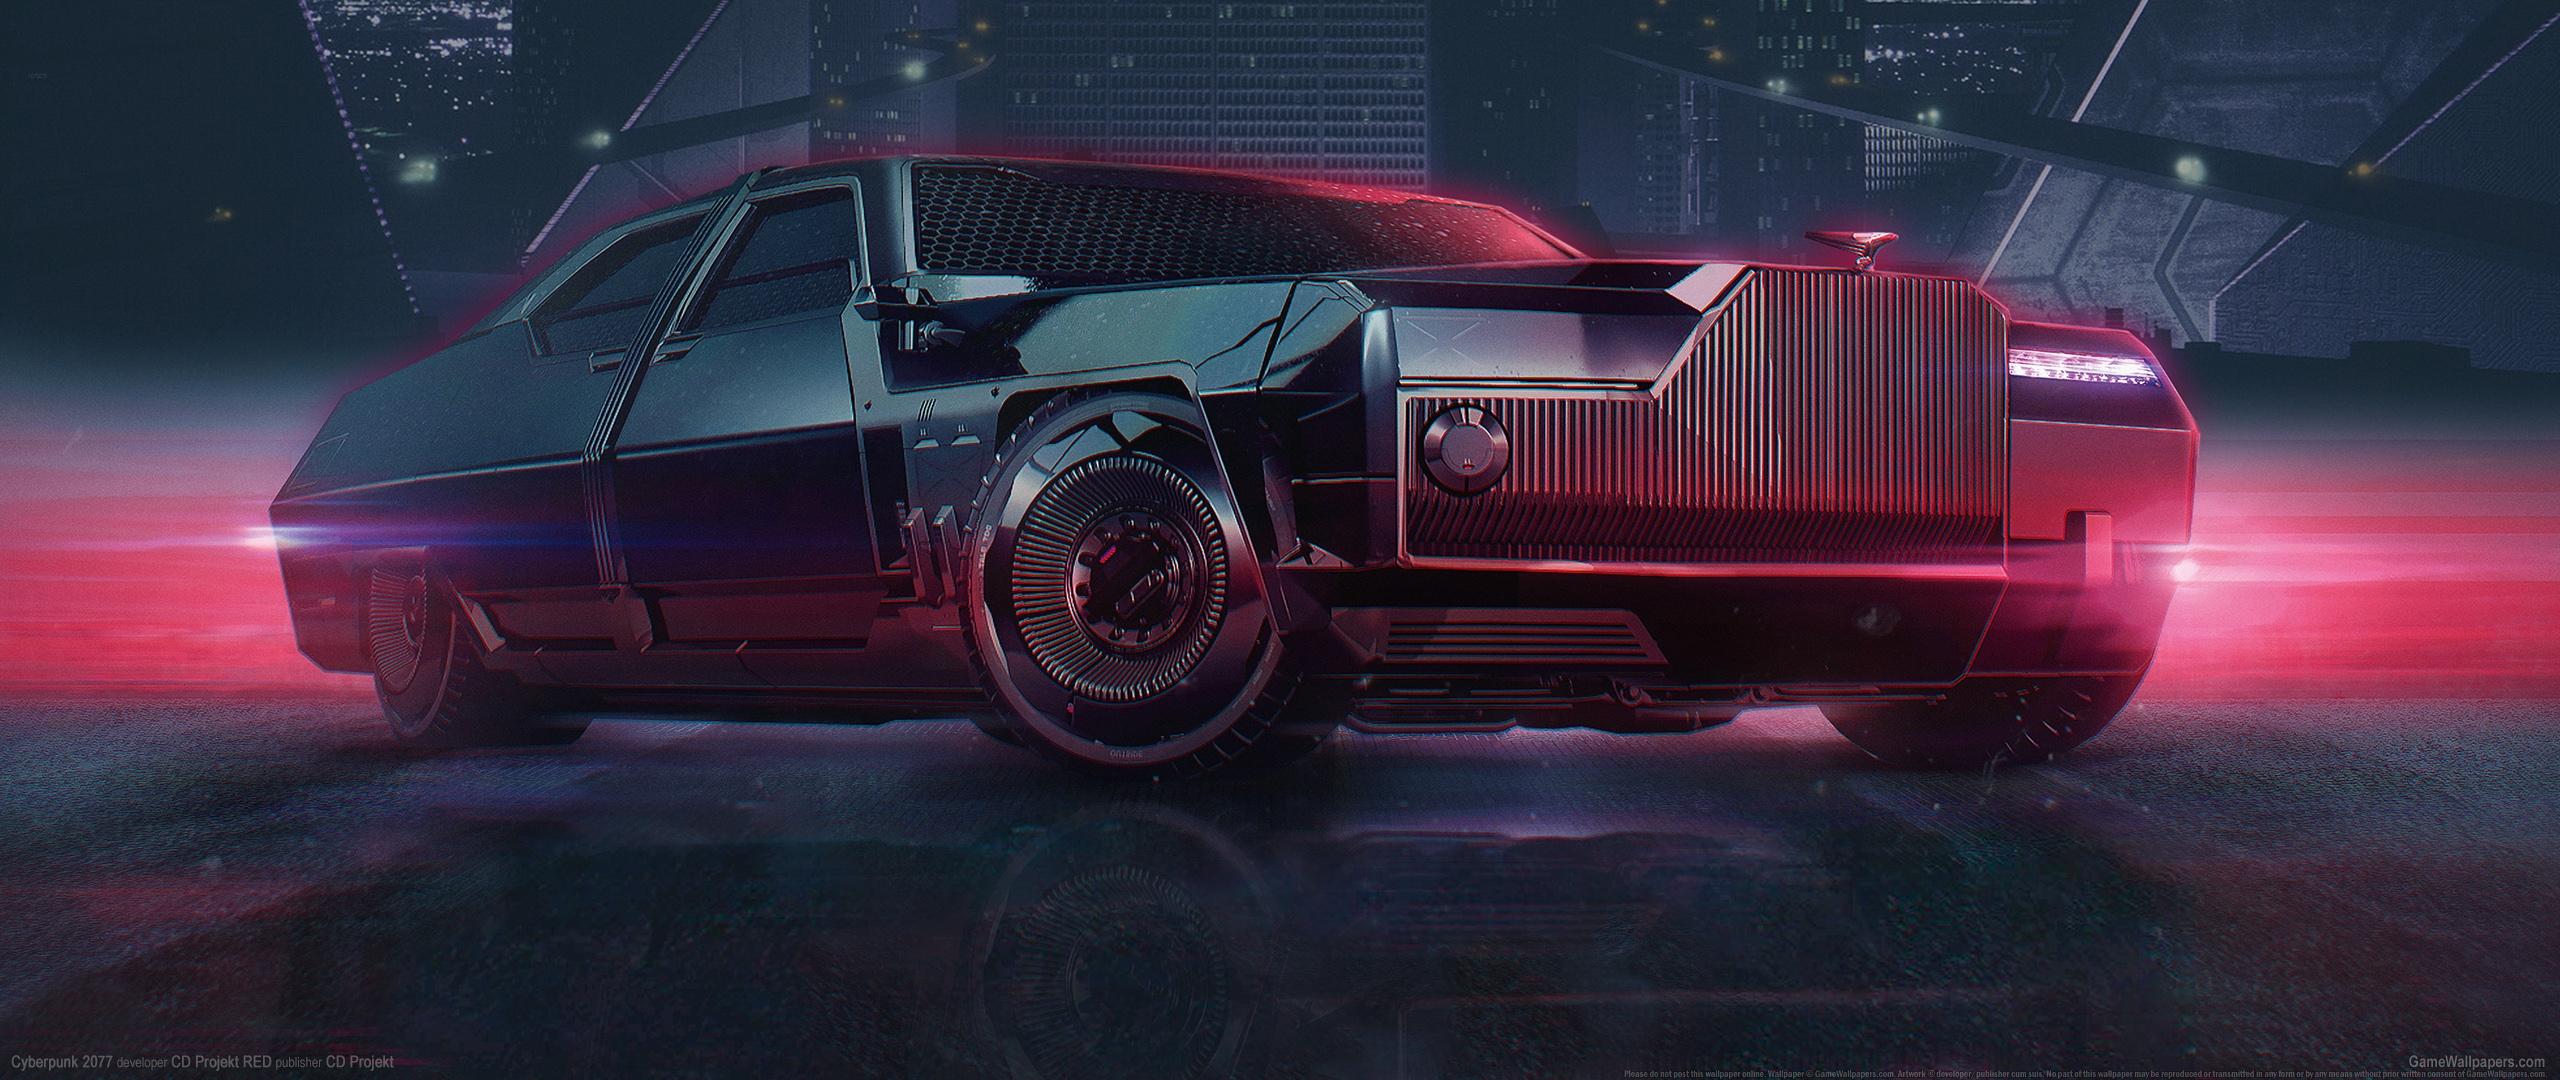 Cyberpunk 2077 2560x1080 achtergrond 26